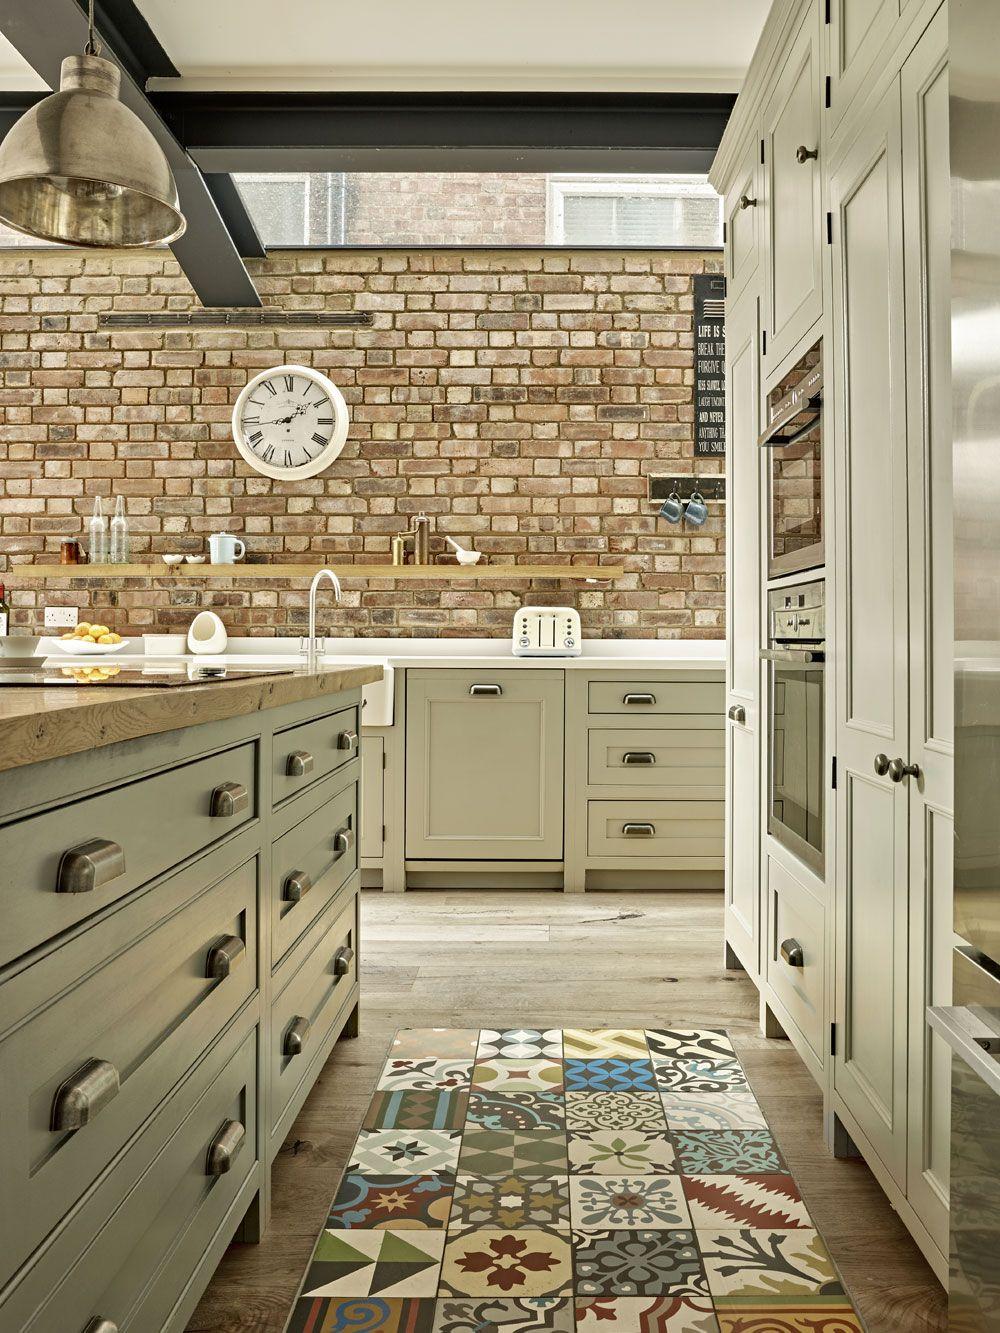 Caz Myers | Kitchen interior, Old fashioned kitchen ...